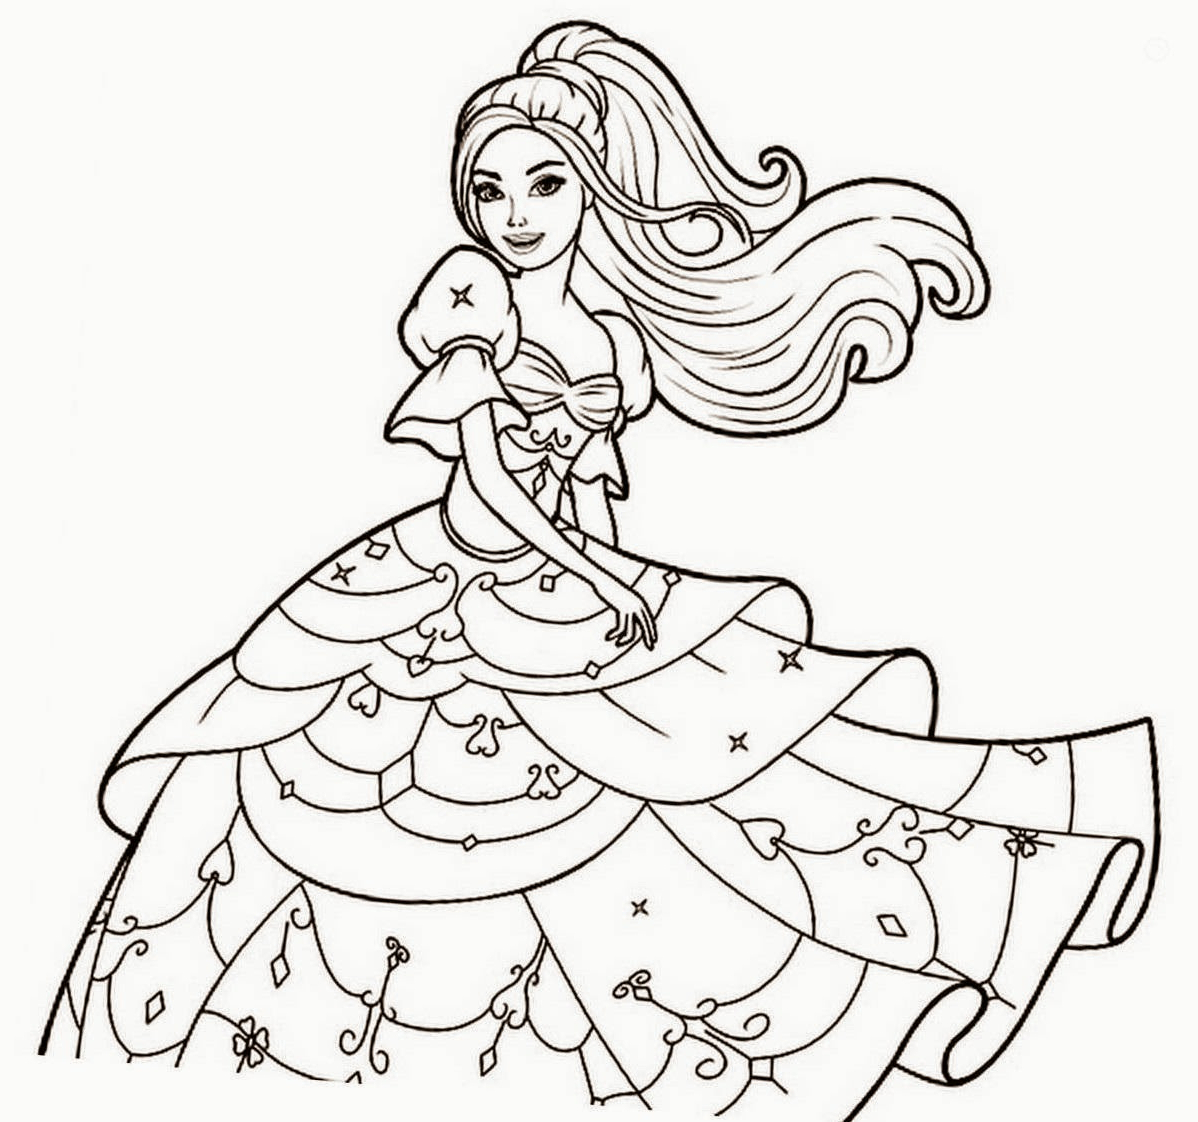 1198x1122 Barbie Doll Sketch How To Draw Barbie, Stepstep, Cartoons